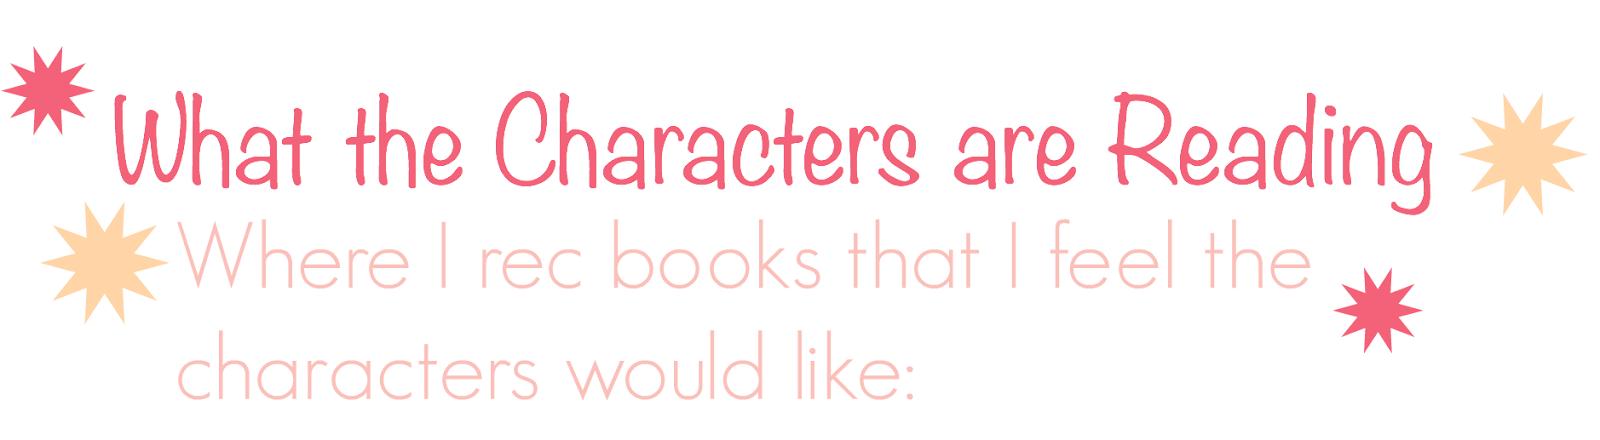 Pink Polka Dot Books Rush By Sara Bennett Wealer A